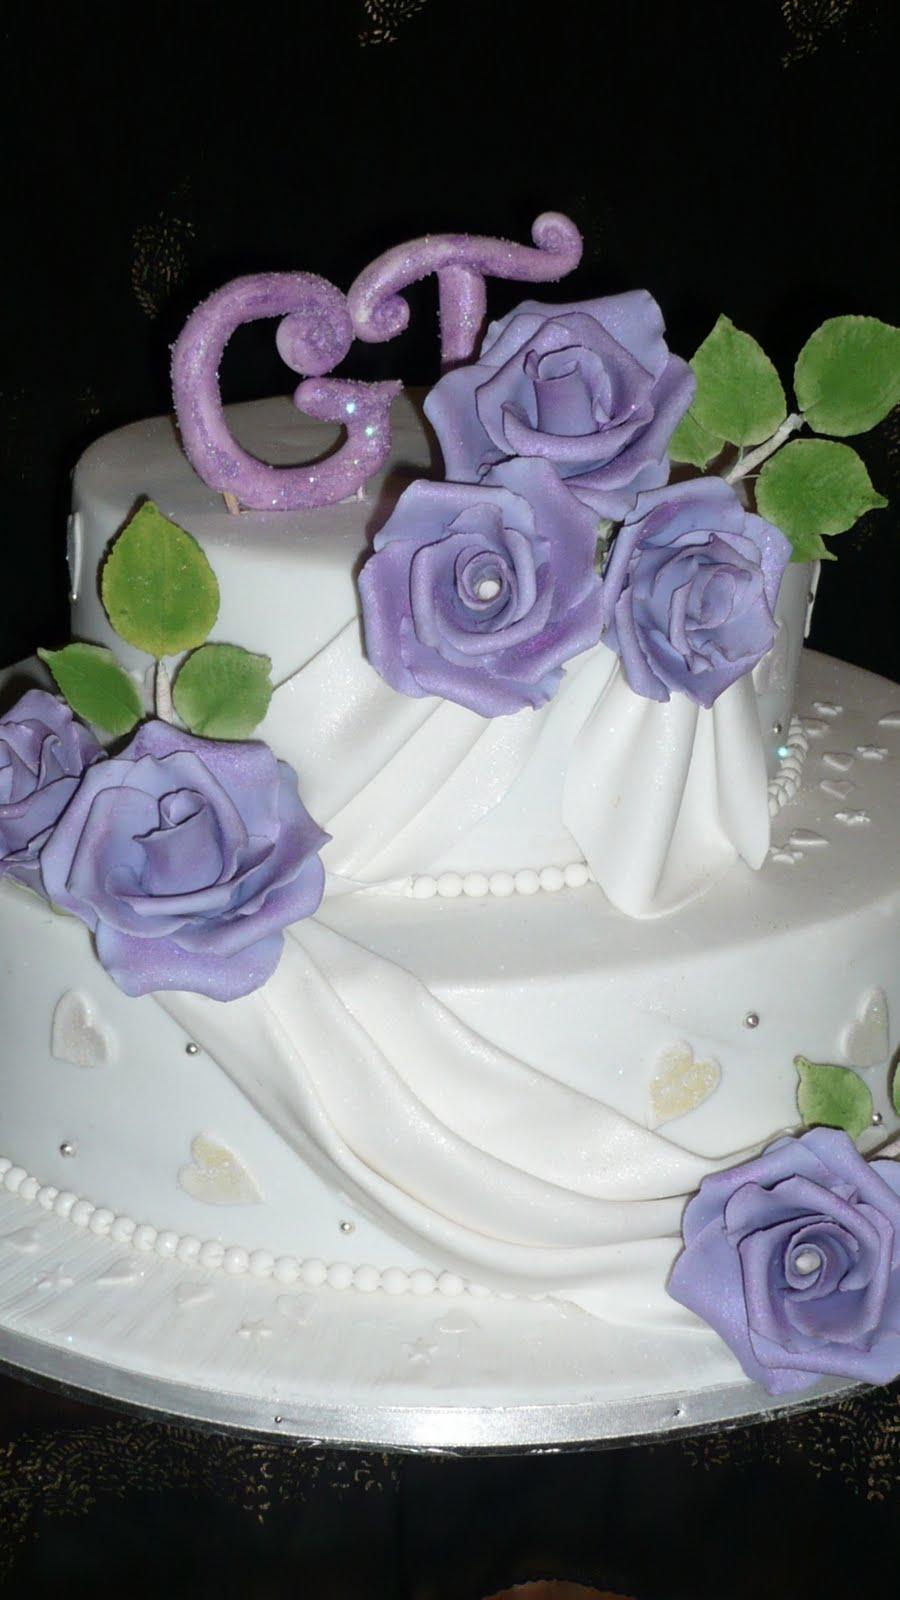 10th Anniversary Cake Ideas